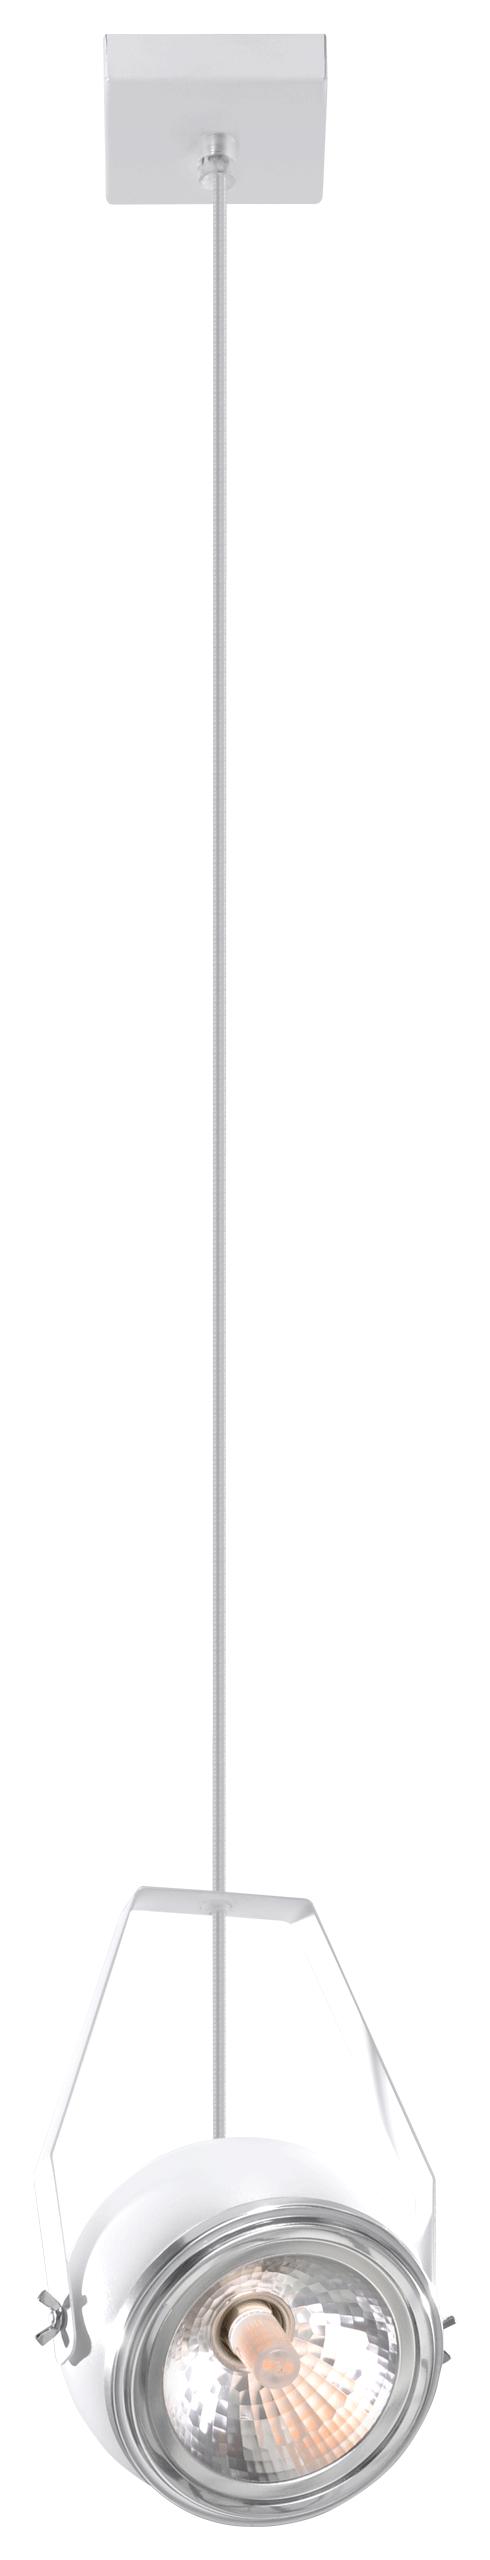 nowoczesna lampa oczko 05